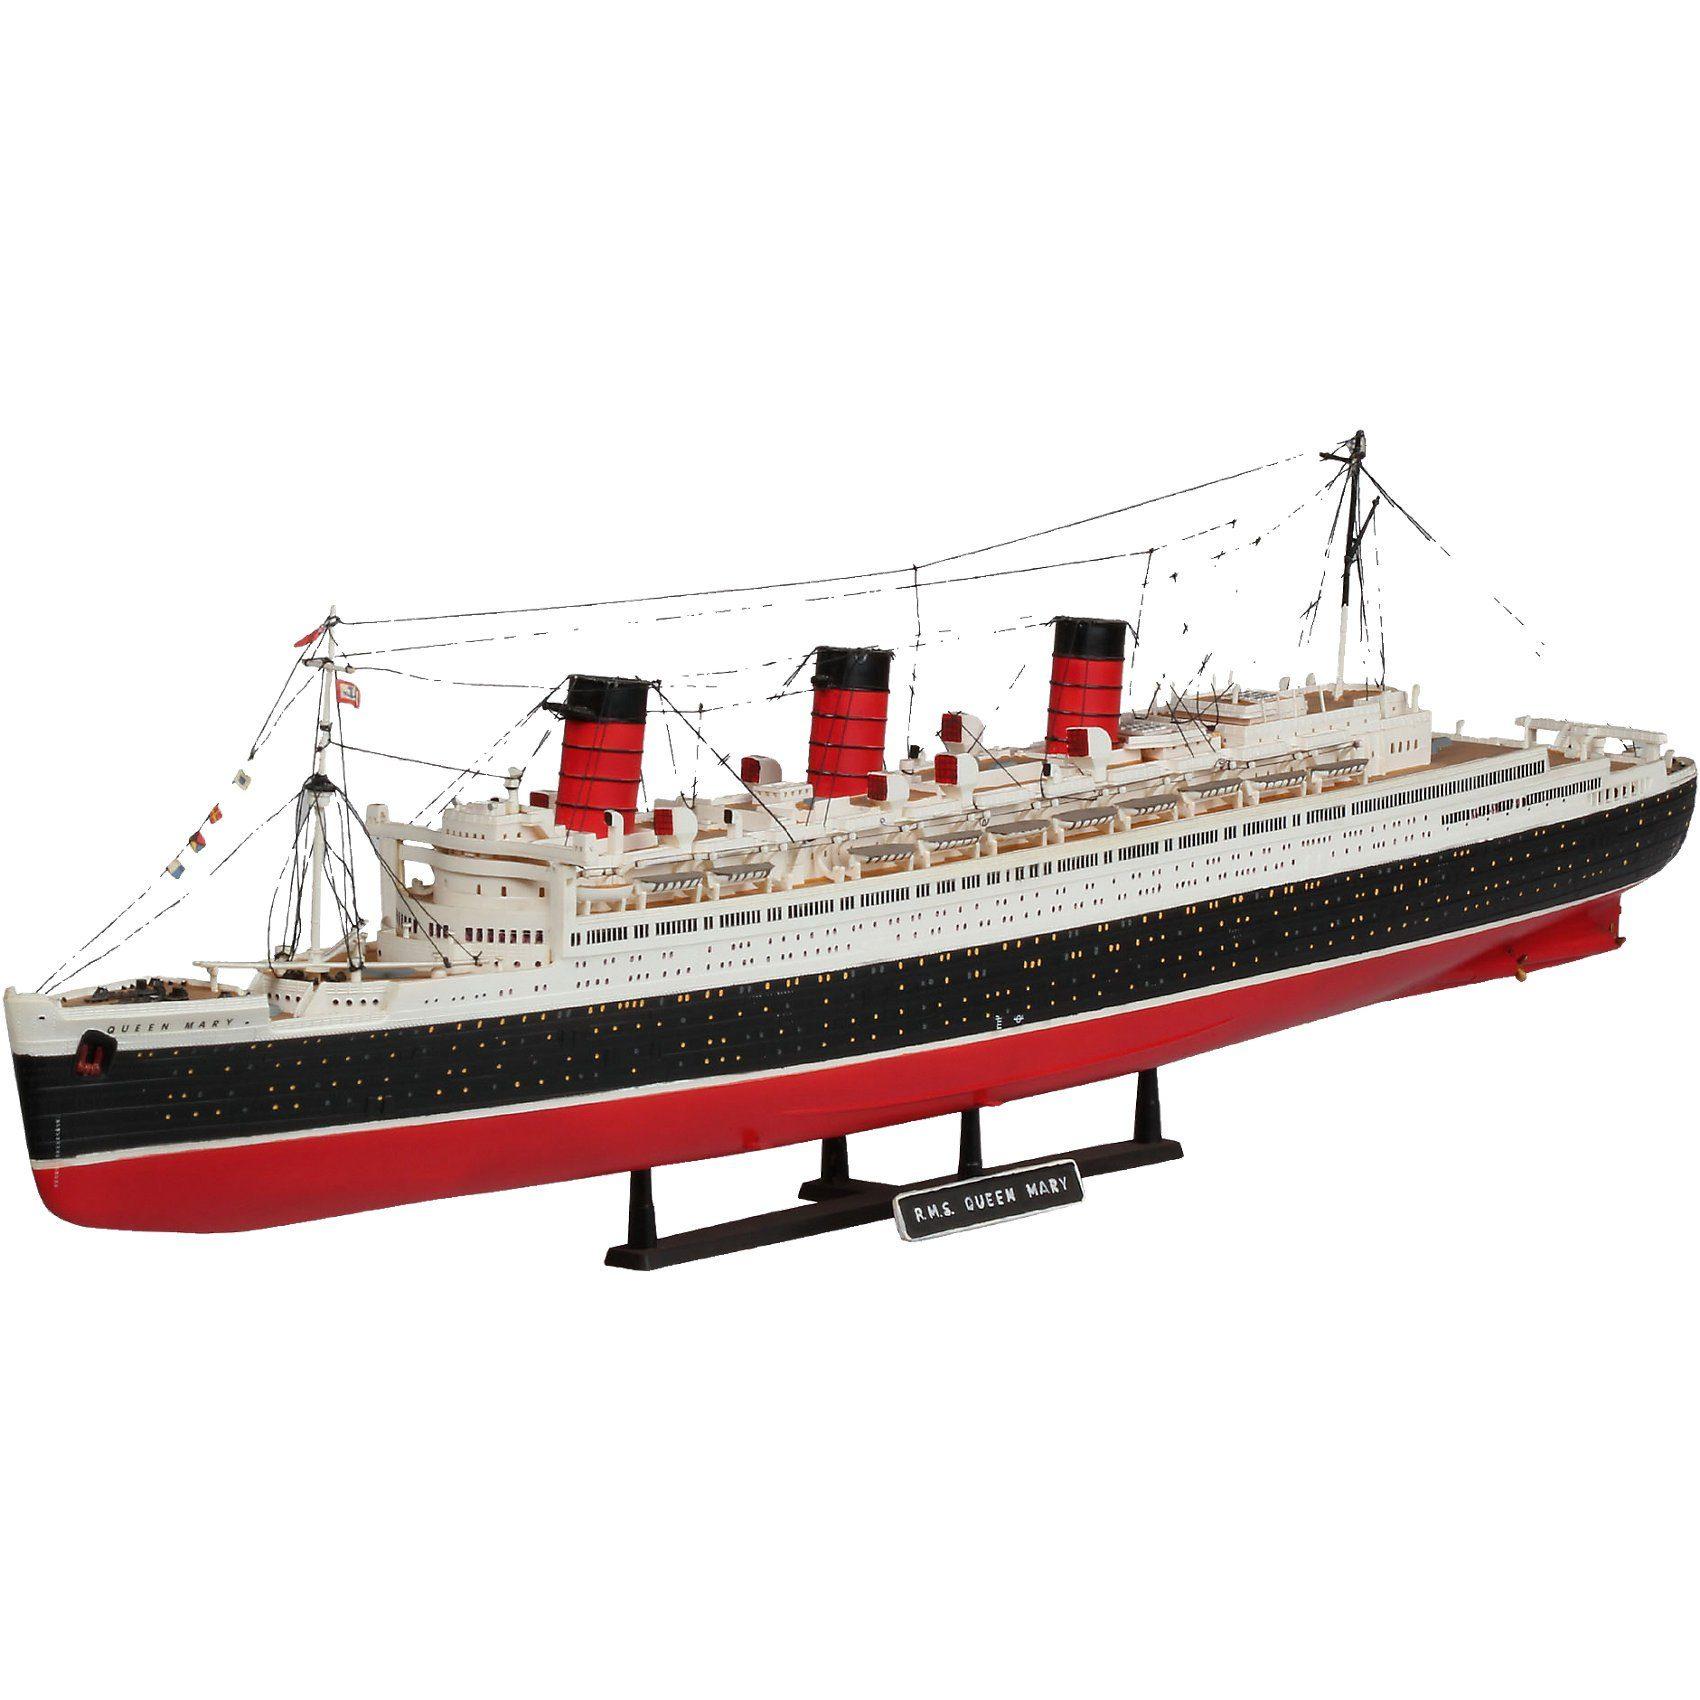 Revell Modellbausatz Queen Mary im Maßstab 1:570